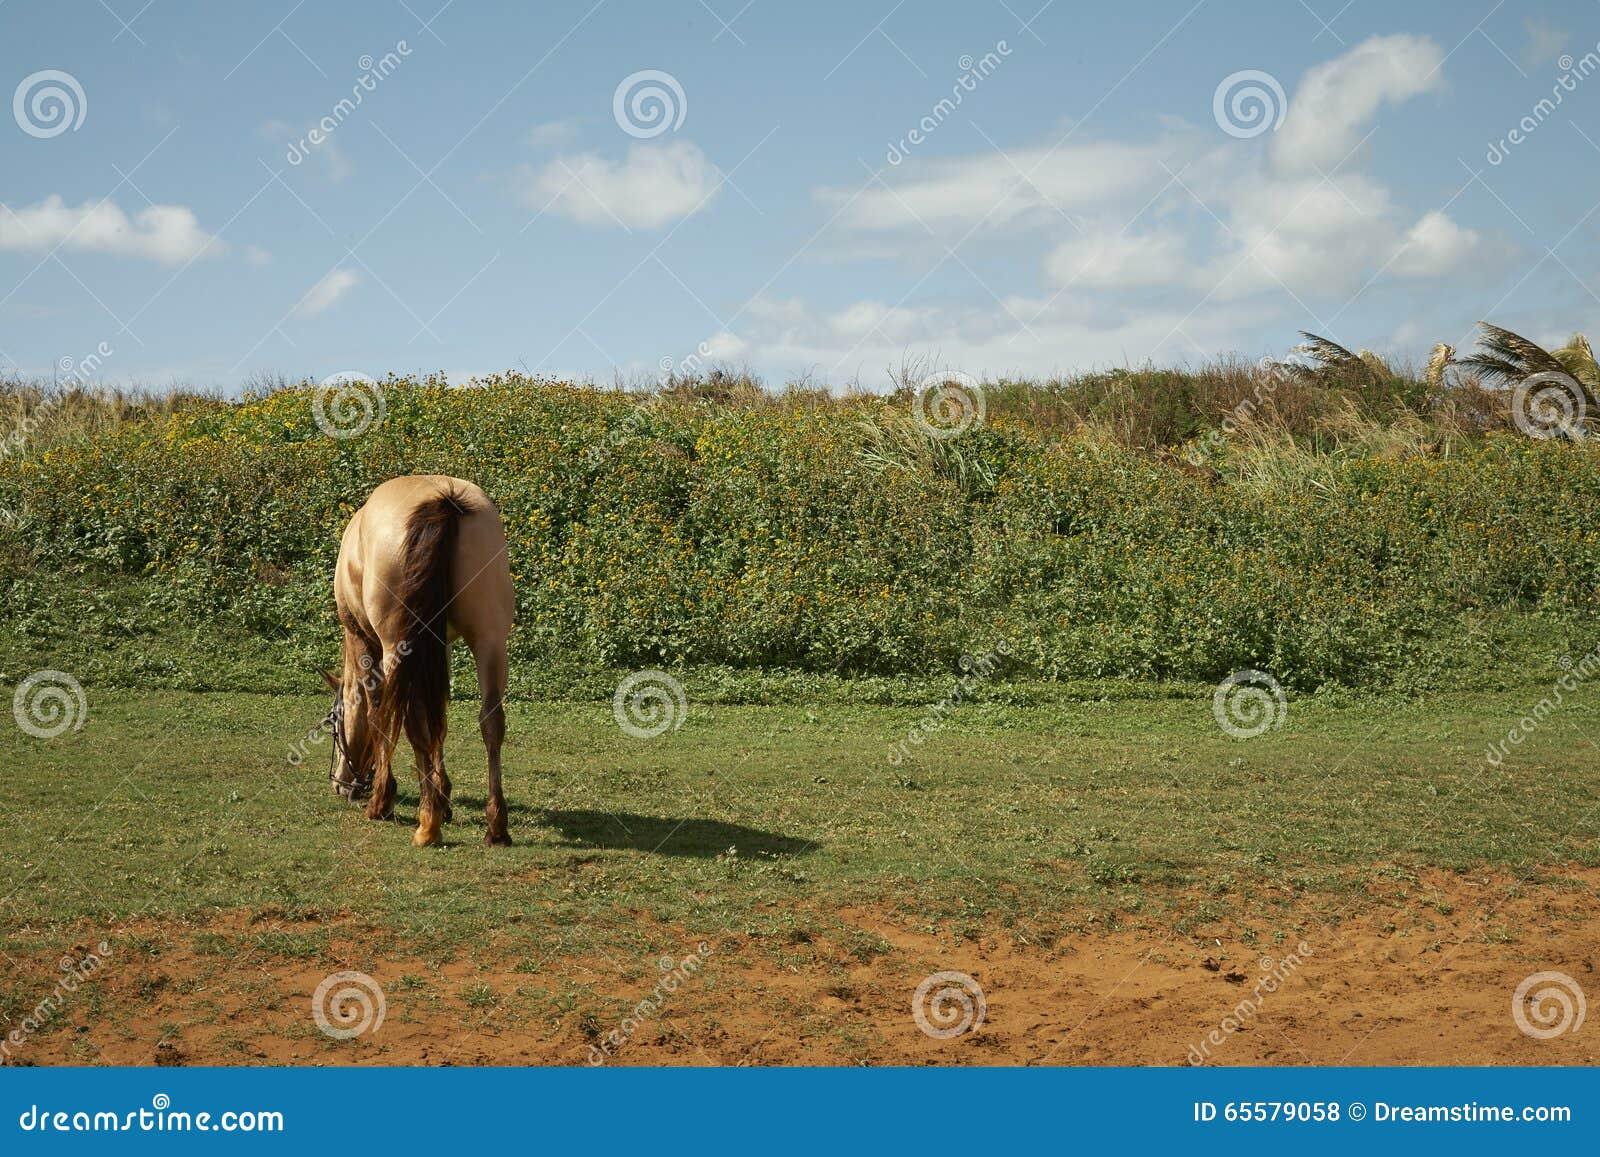 Pastando o cavalo - Kauai, Havaí